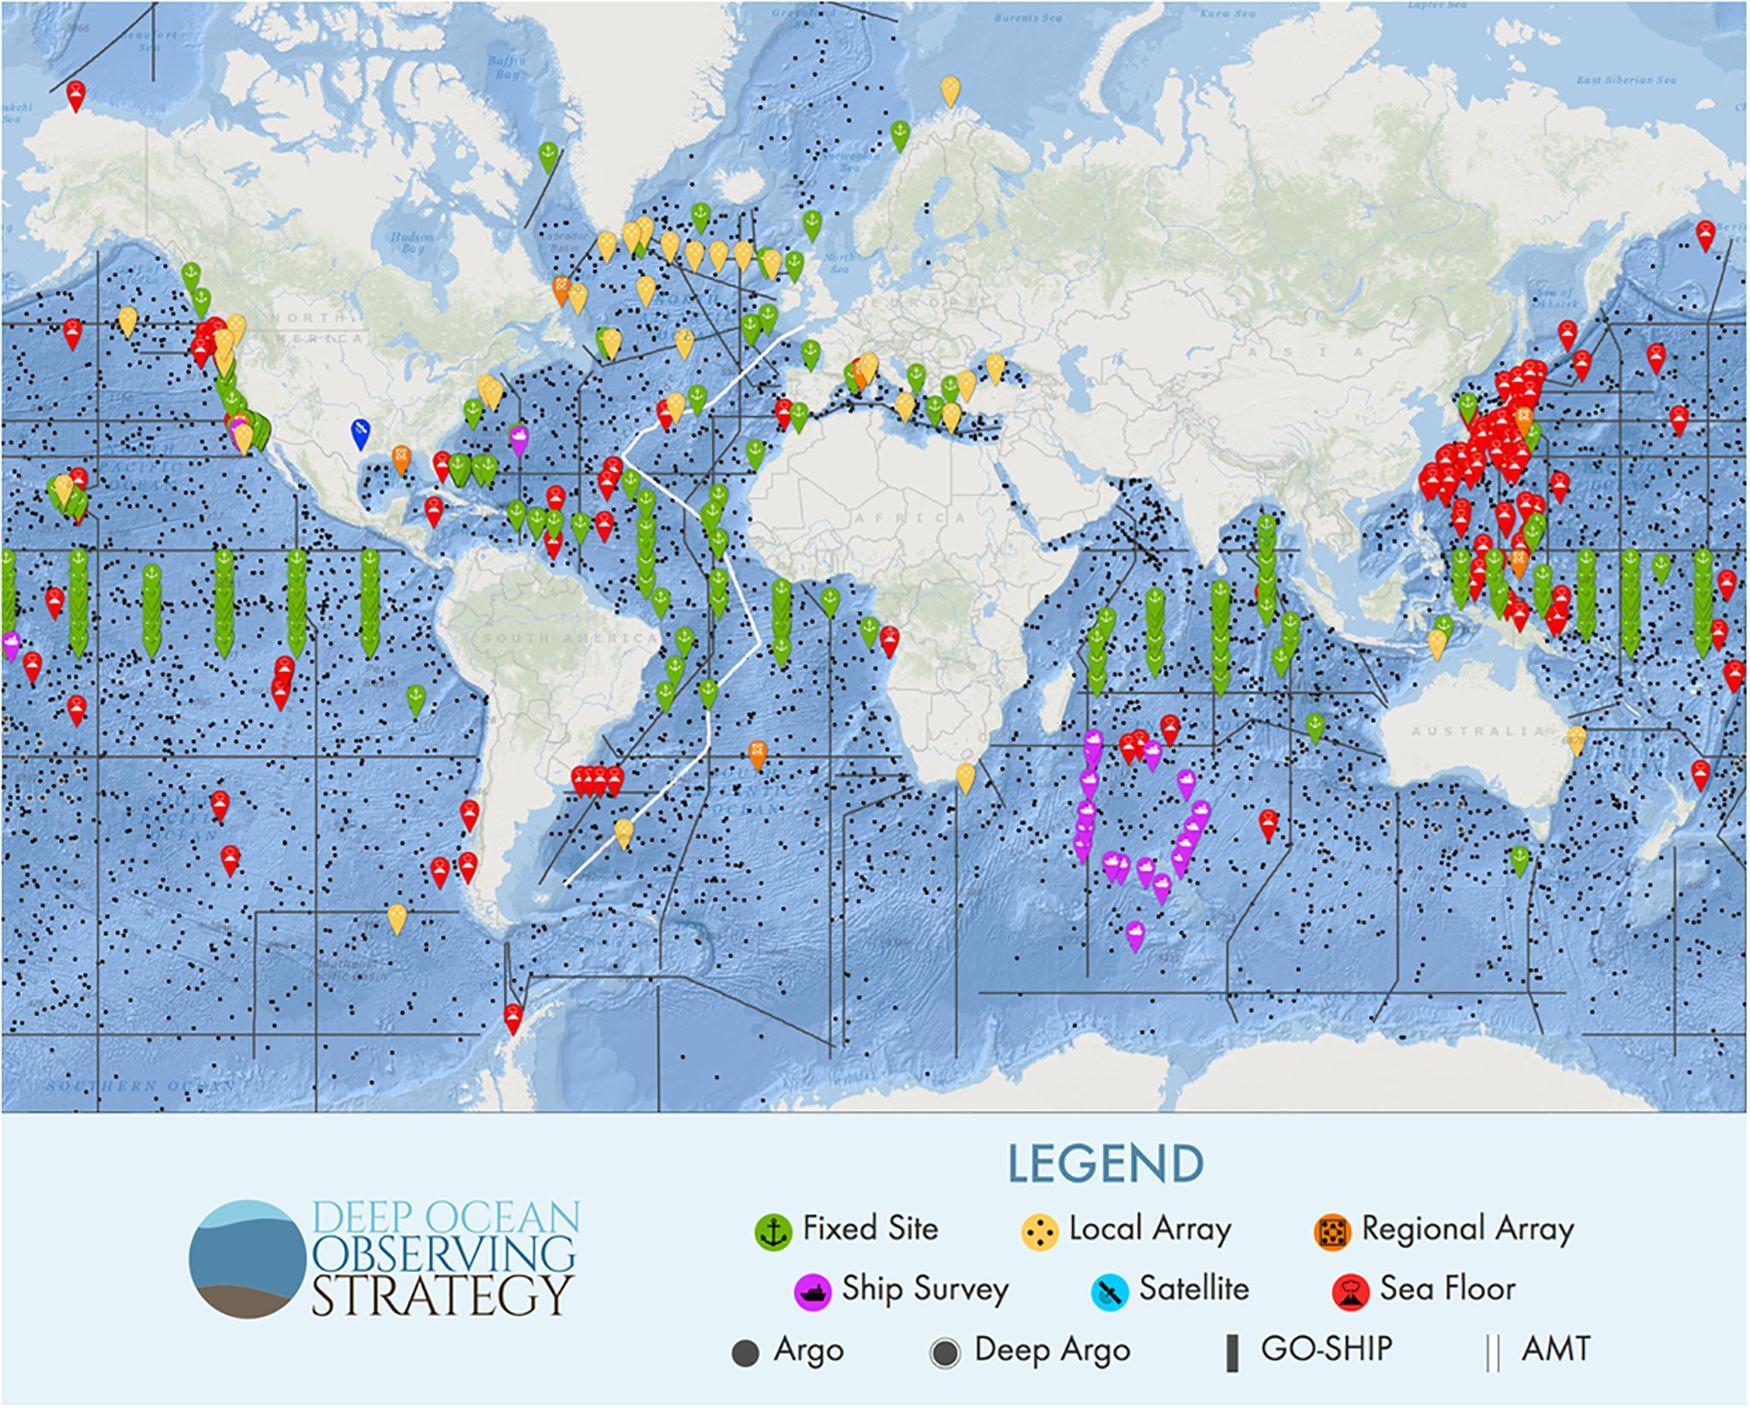 Frontiers Global Observing Needs In The Deep Ocean Marine Science